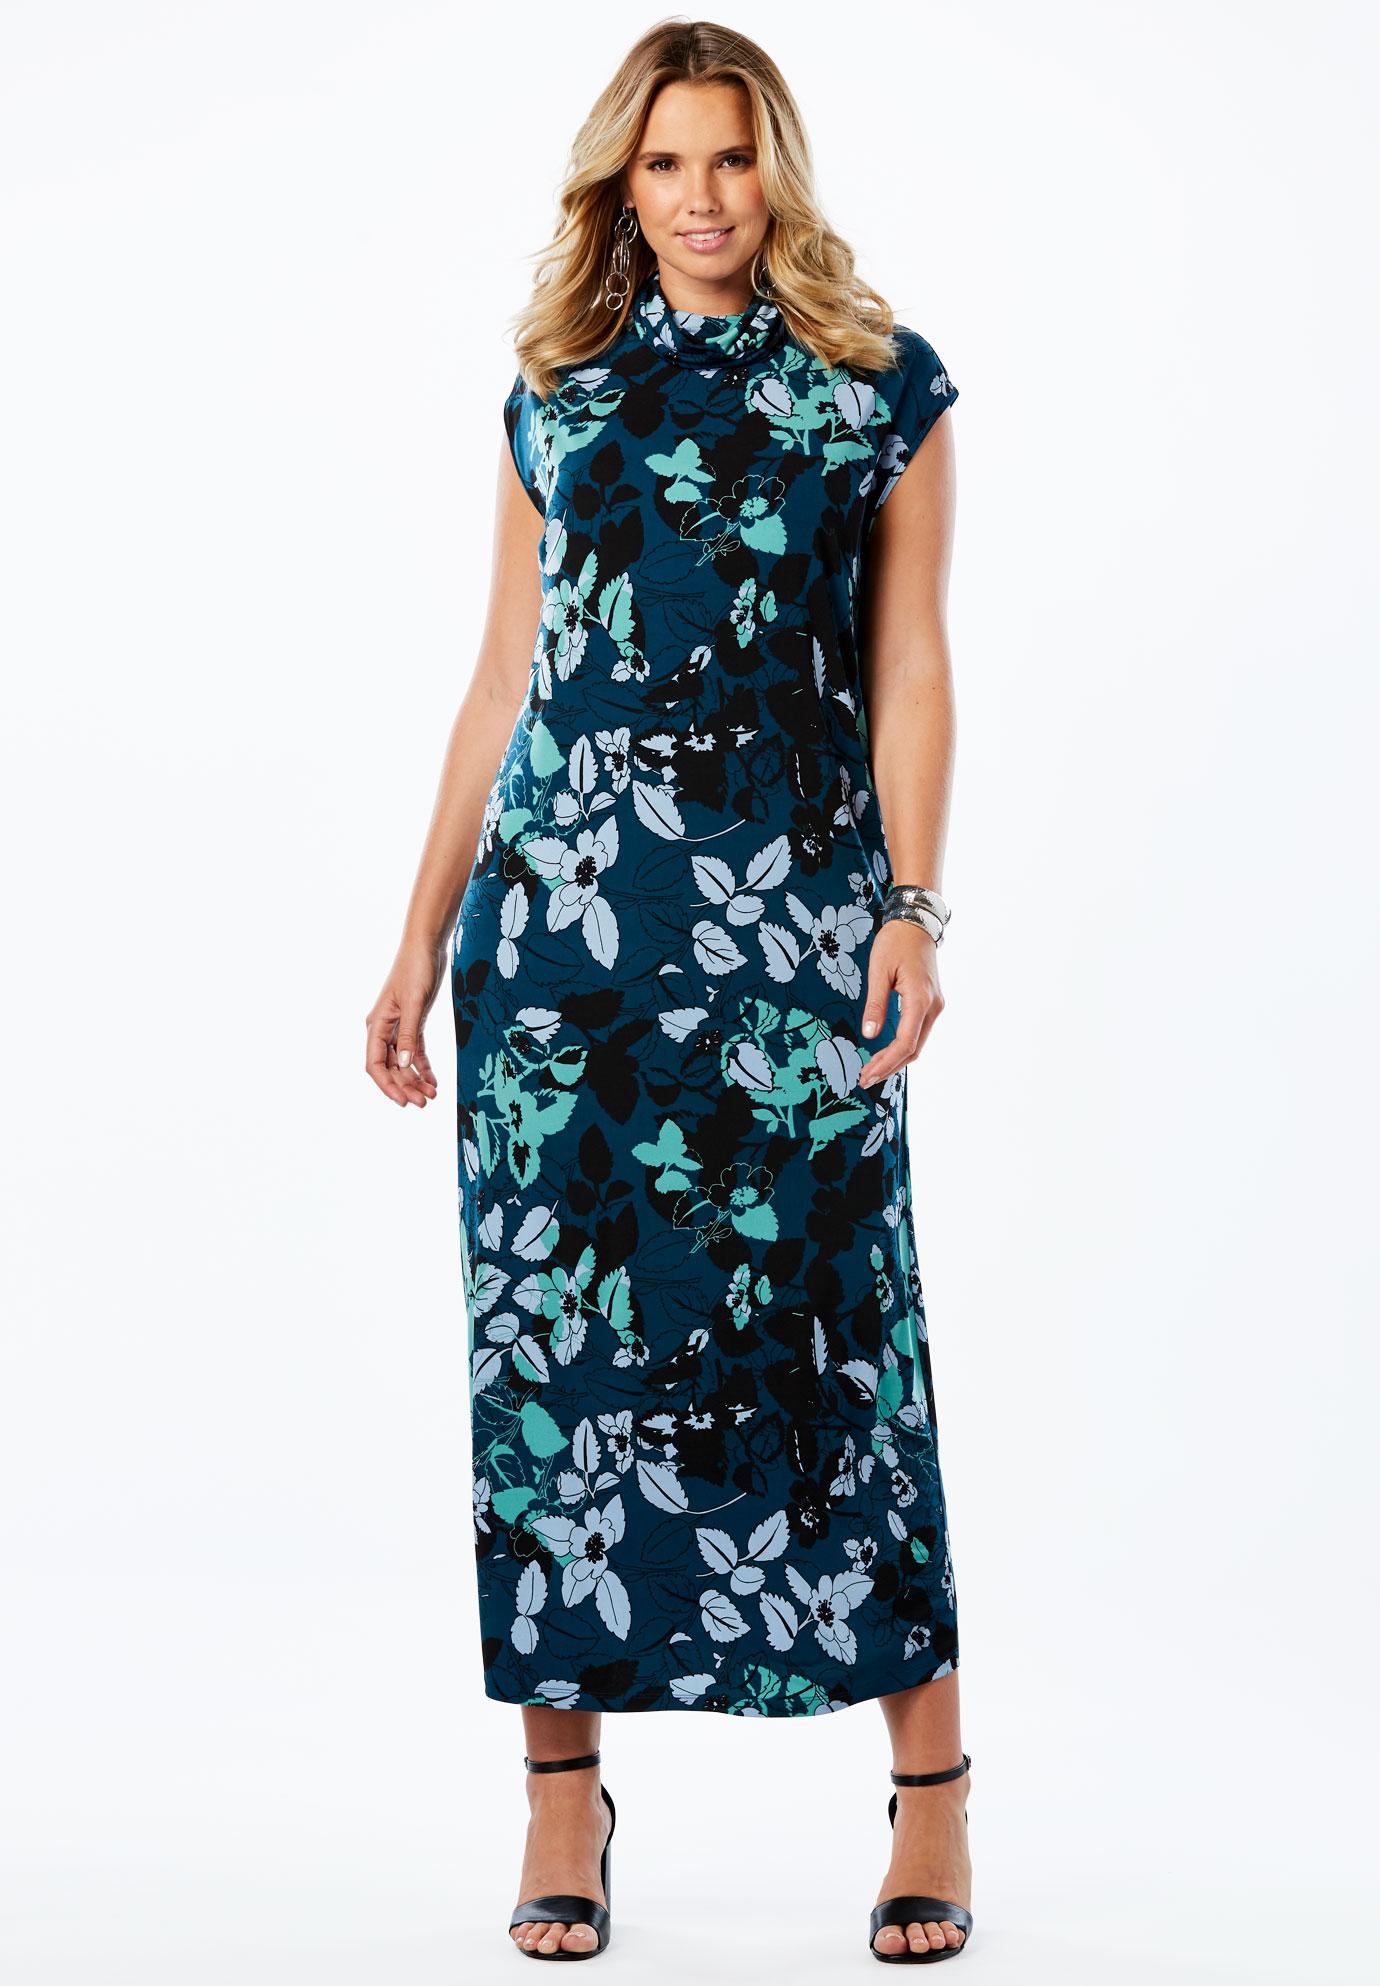 Slouchy Turtleneck Dress